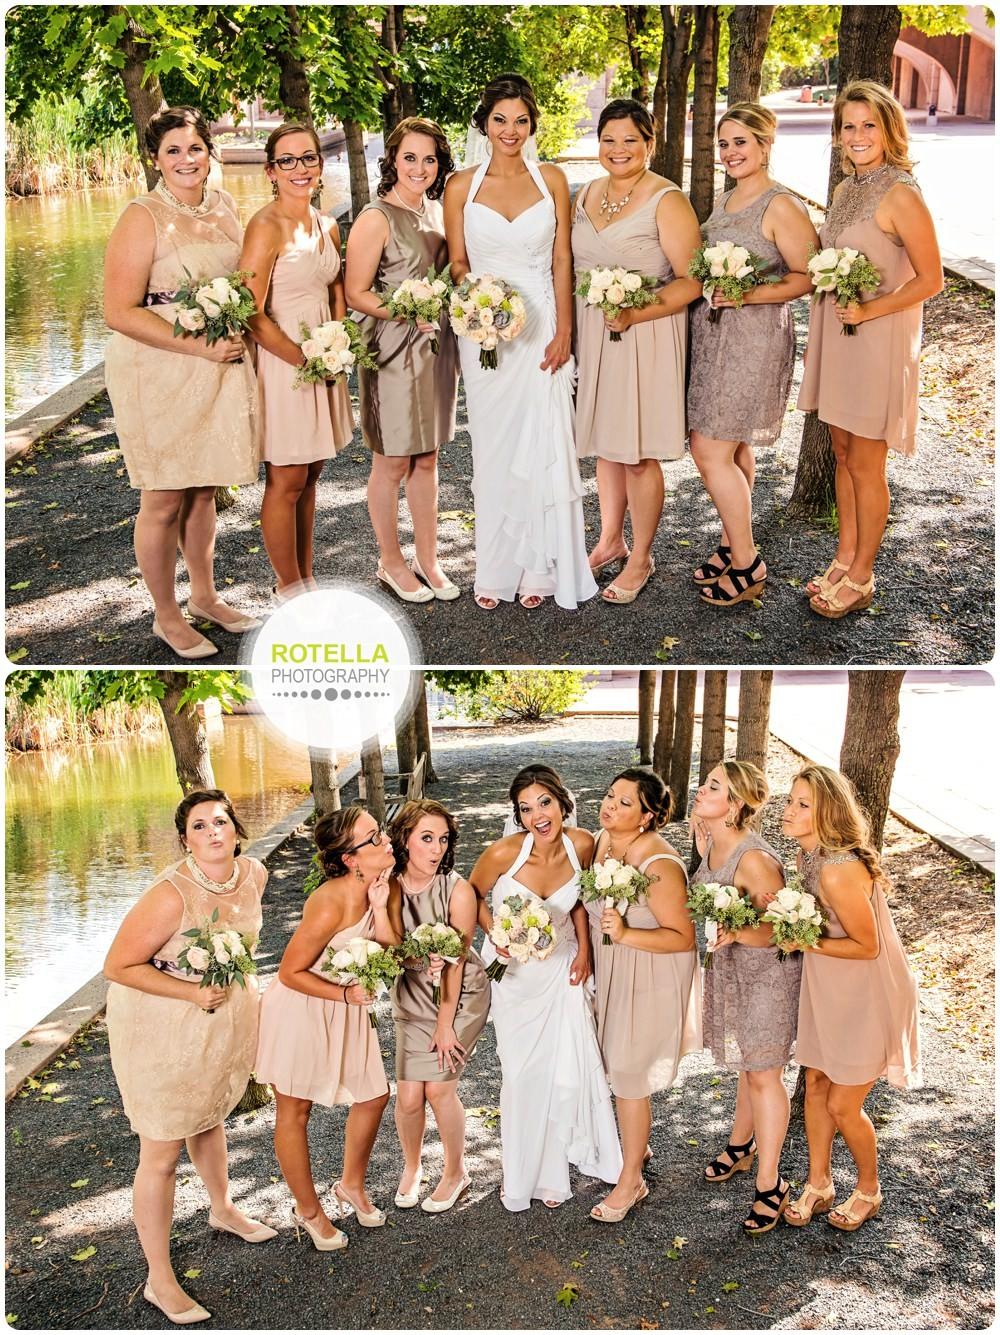 MELANIE-DEREK-MINNESOTA-WEDDING-PHOTOGRAPHY-ROTELLA-PHOTOGRAPHY_2015-06